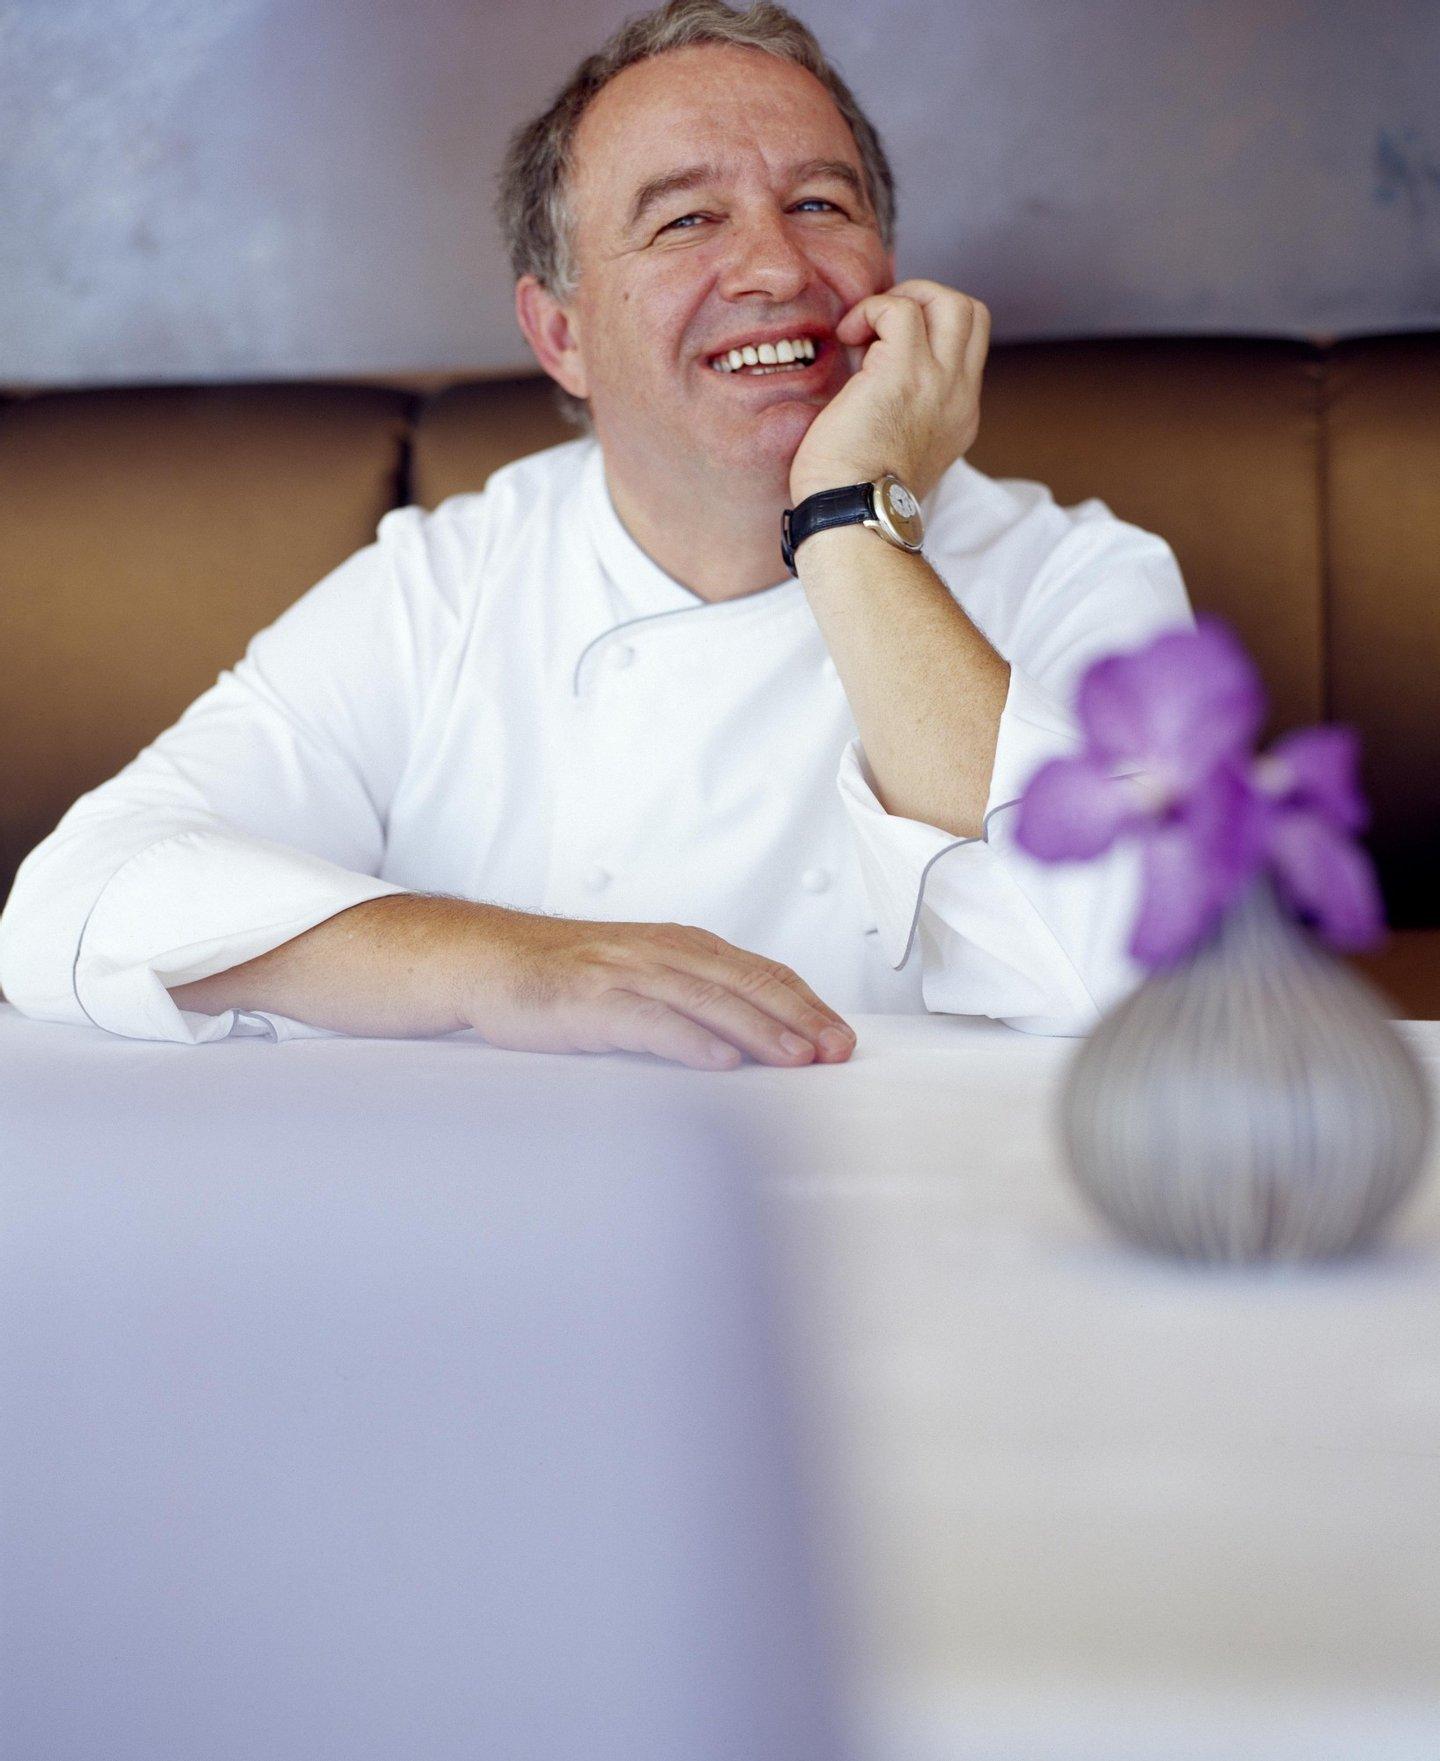 Chef Joachim Koerper